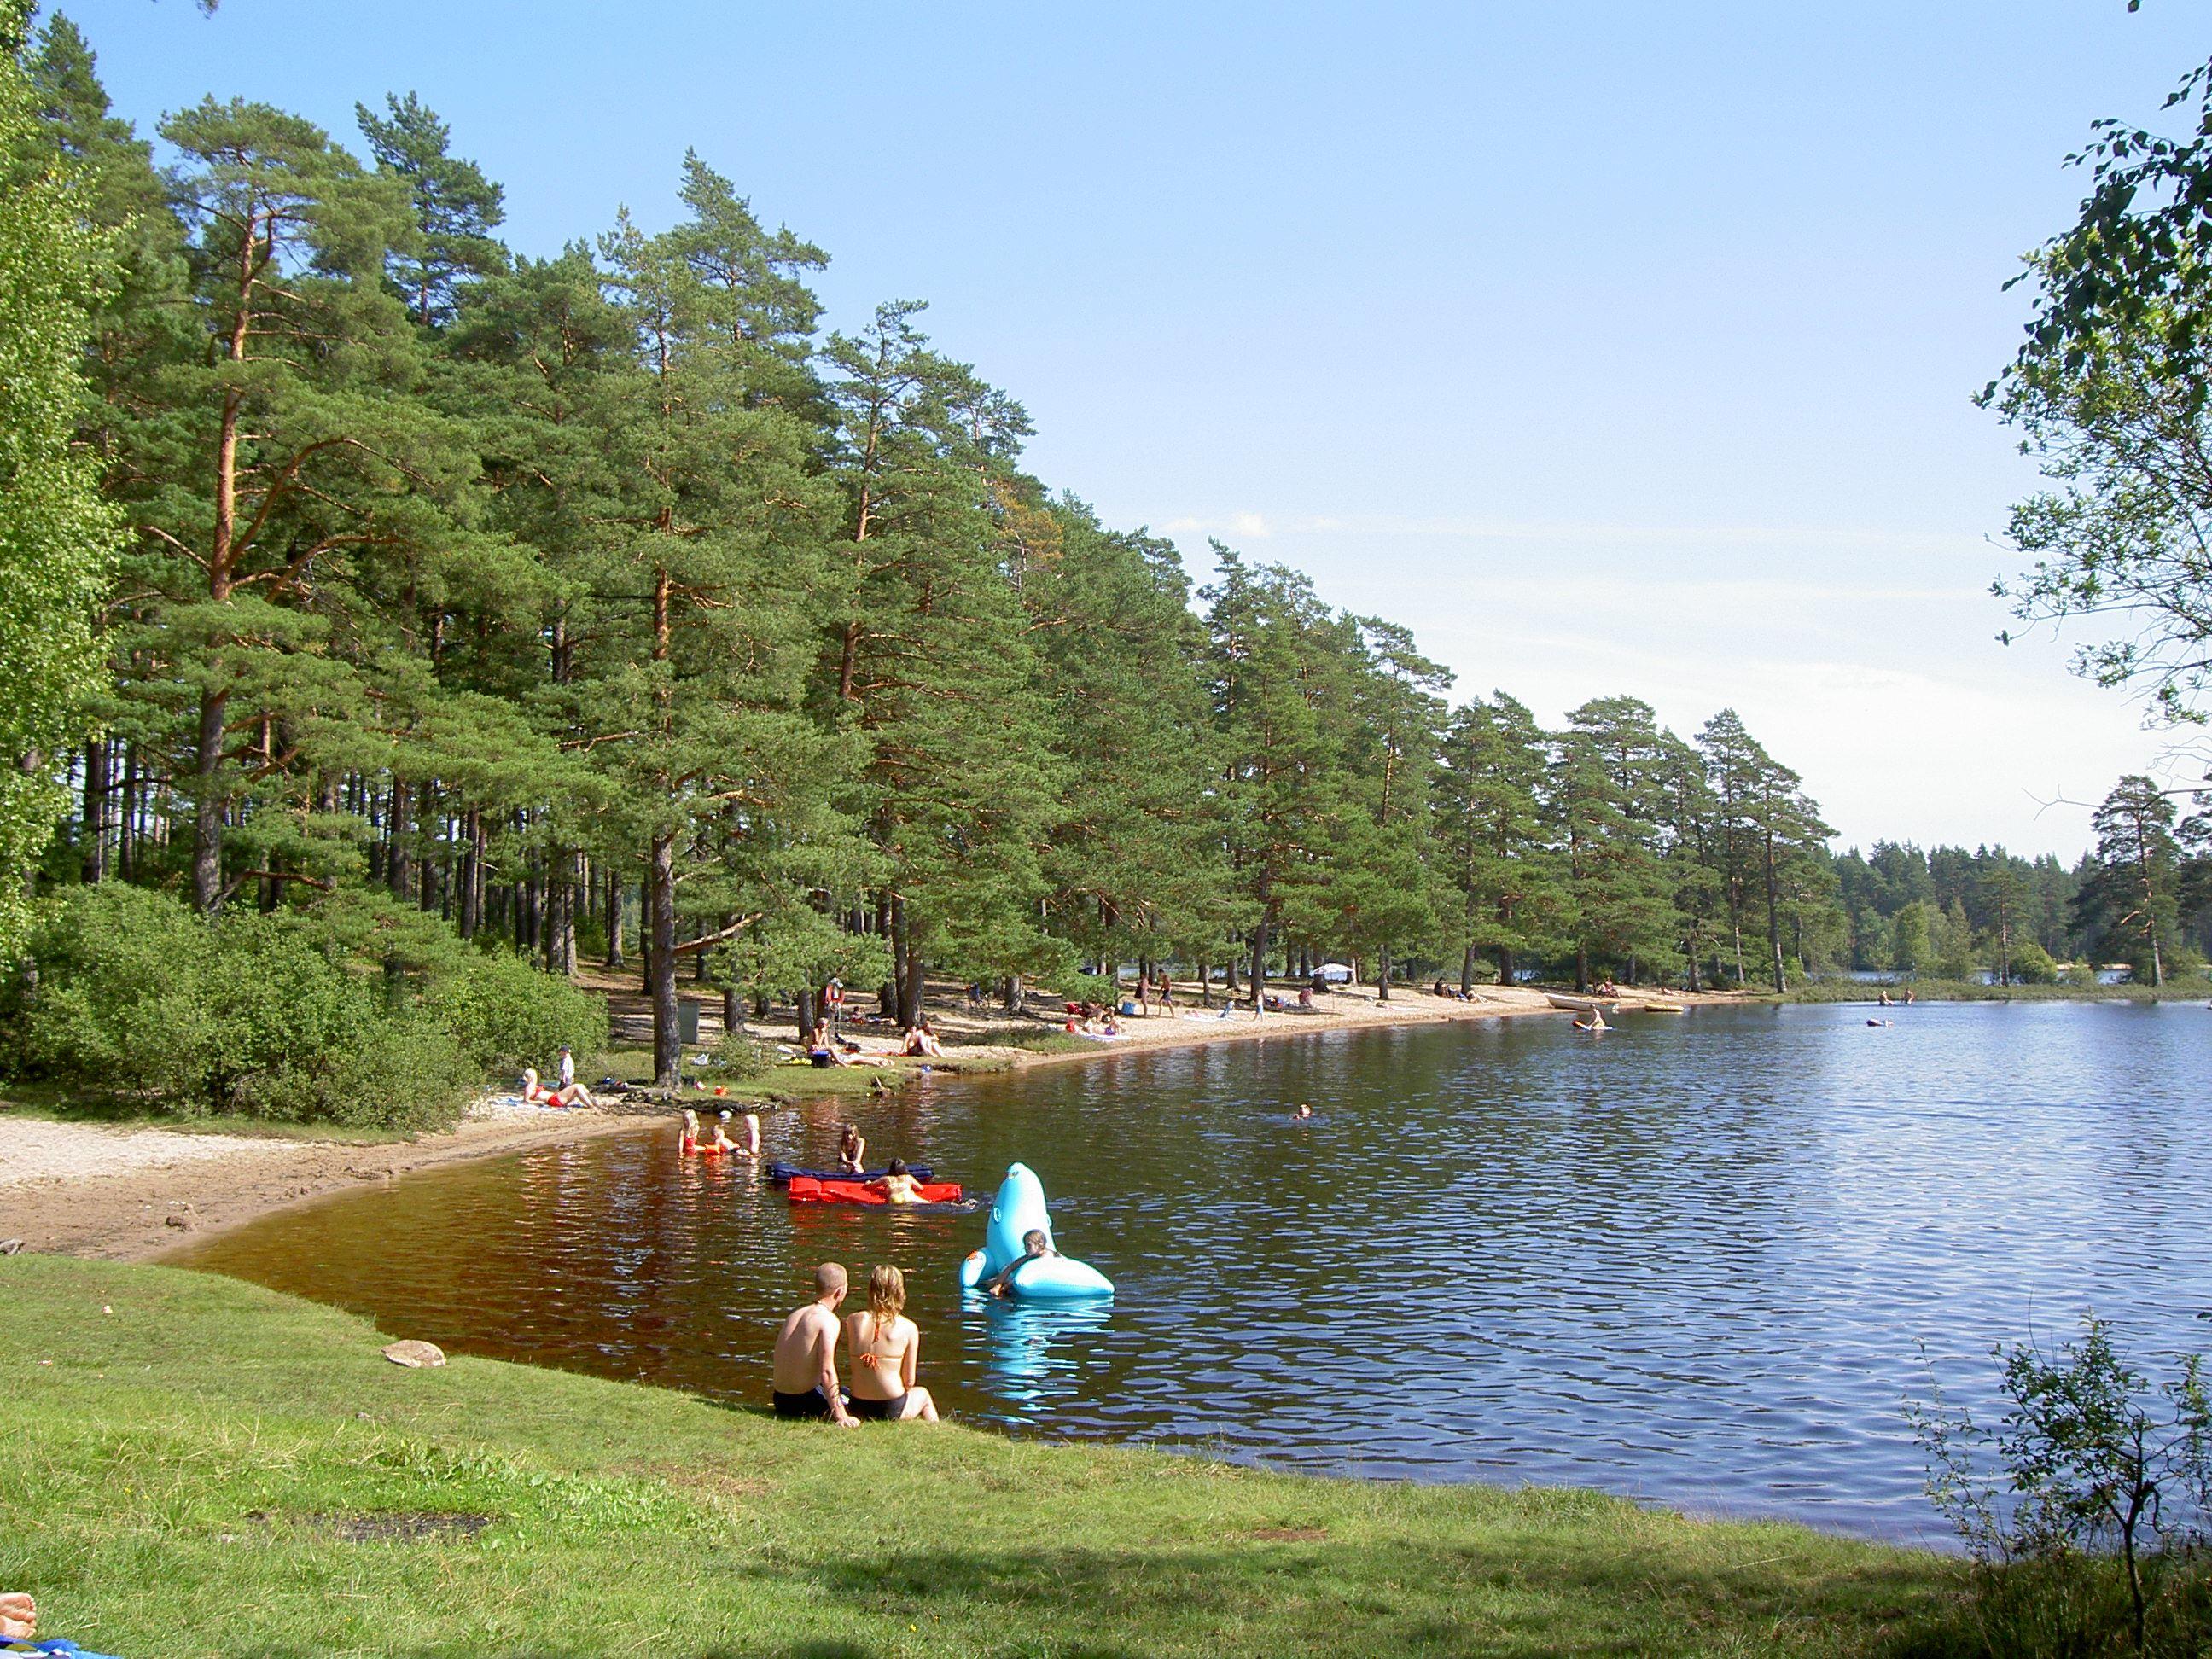 Vaggeryds kommun, Bada i Rolstorpasjön - Stranden